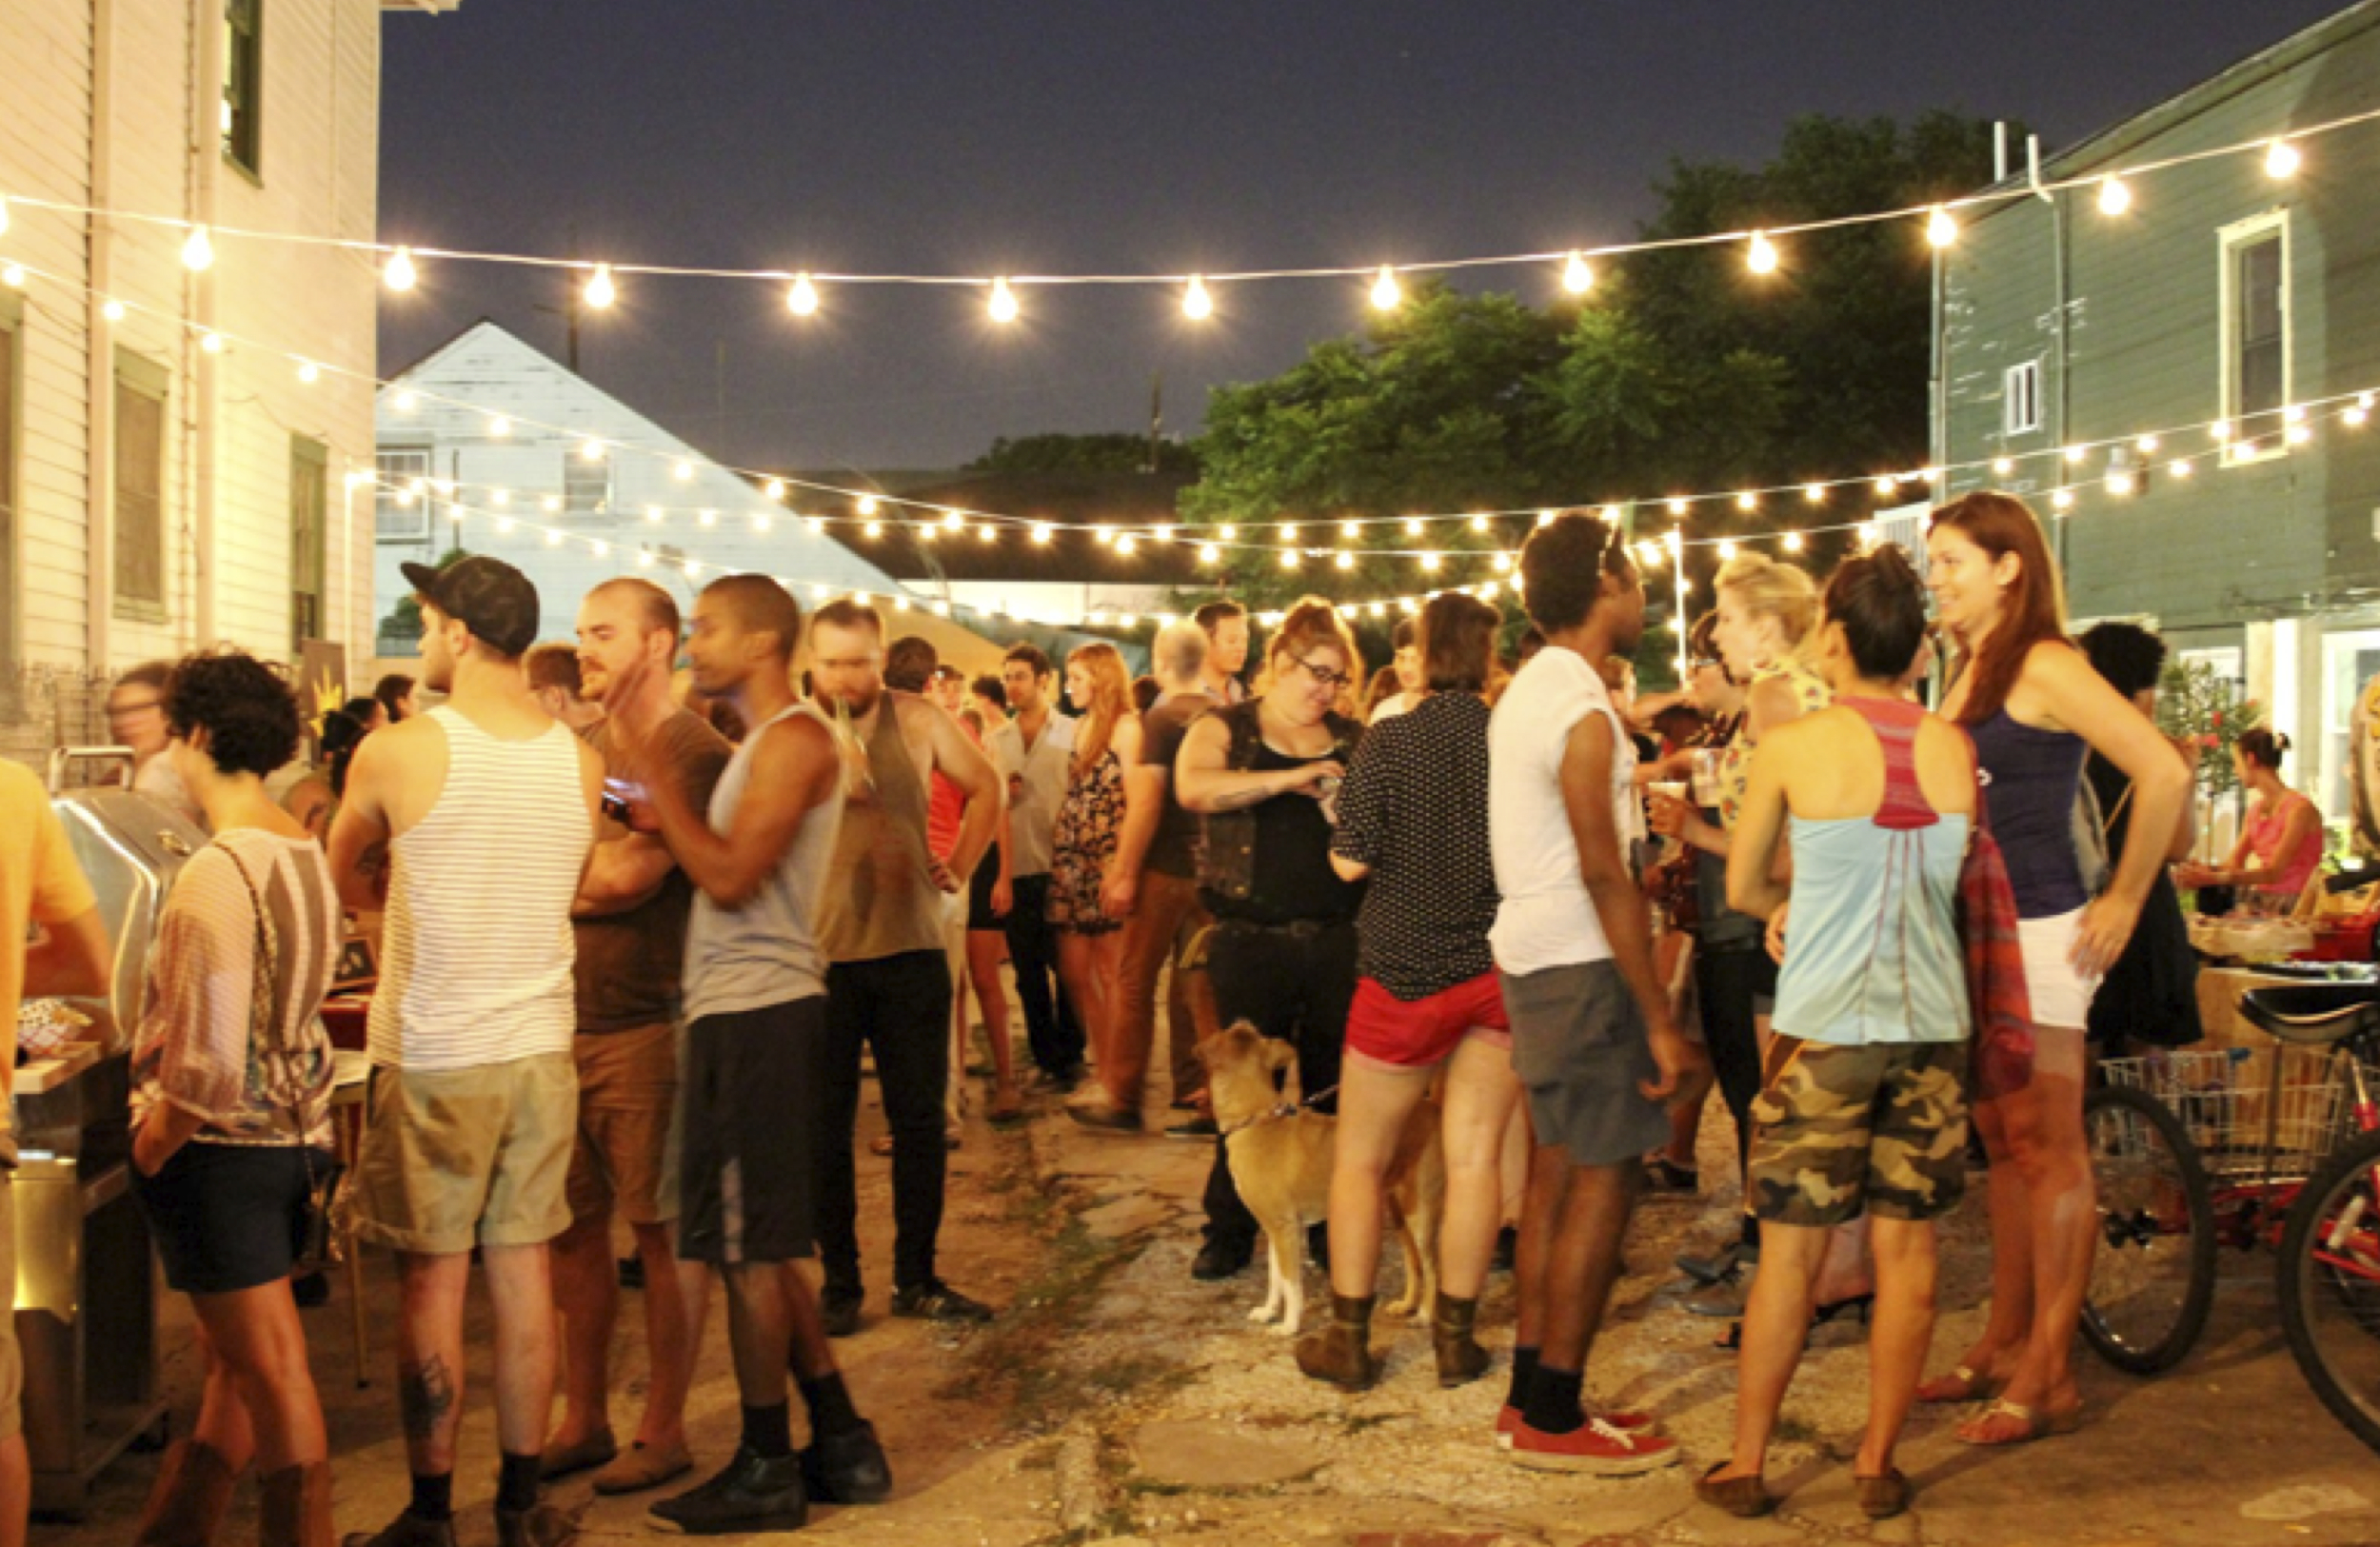 ONE REEL Presents Urban Beach Party & Beer Garden | Seattle Street ...